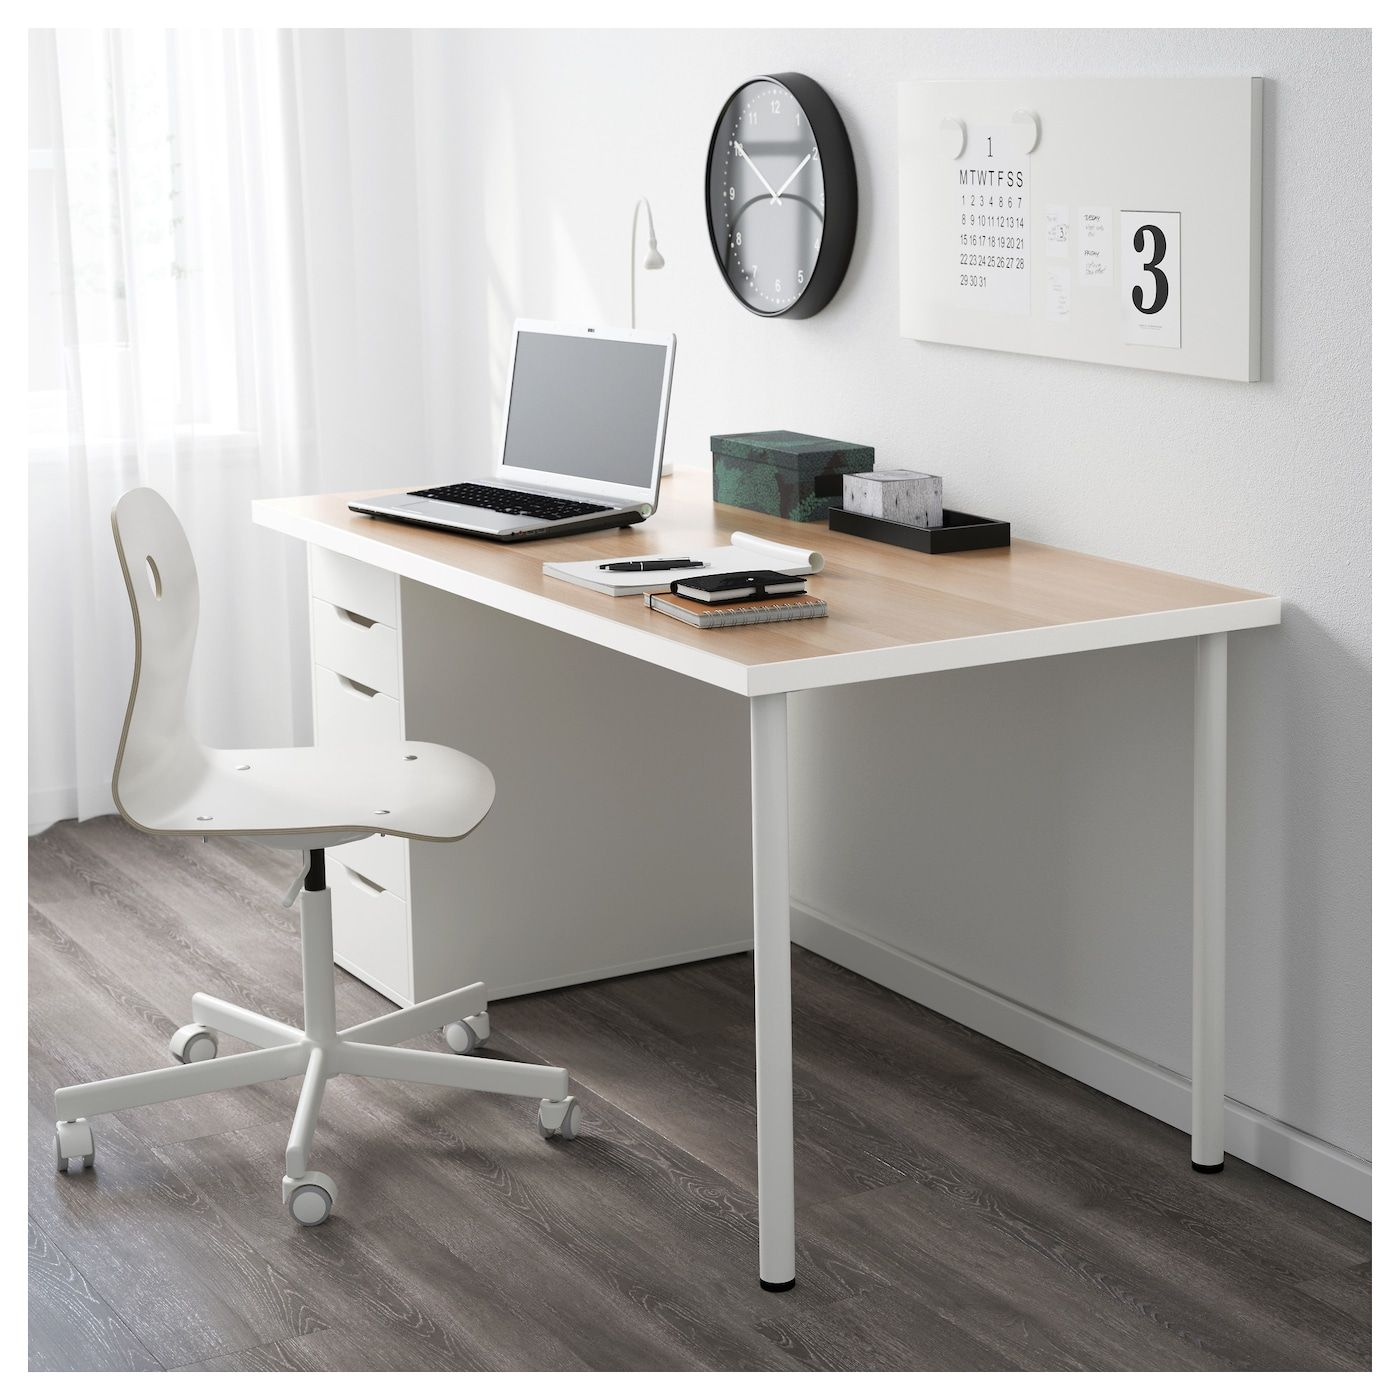 Linnmon Alex Table White White Stained Oak Effect White 59x29 1 2 Ikea Ikea Table Hack Ikea Home Office Furniture